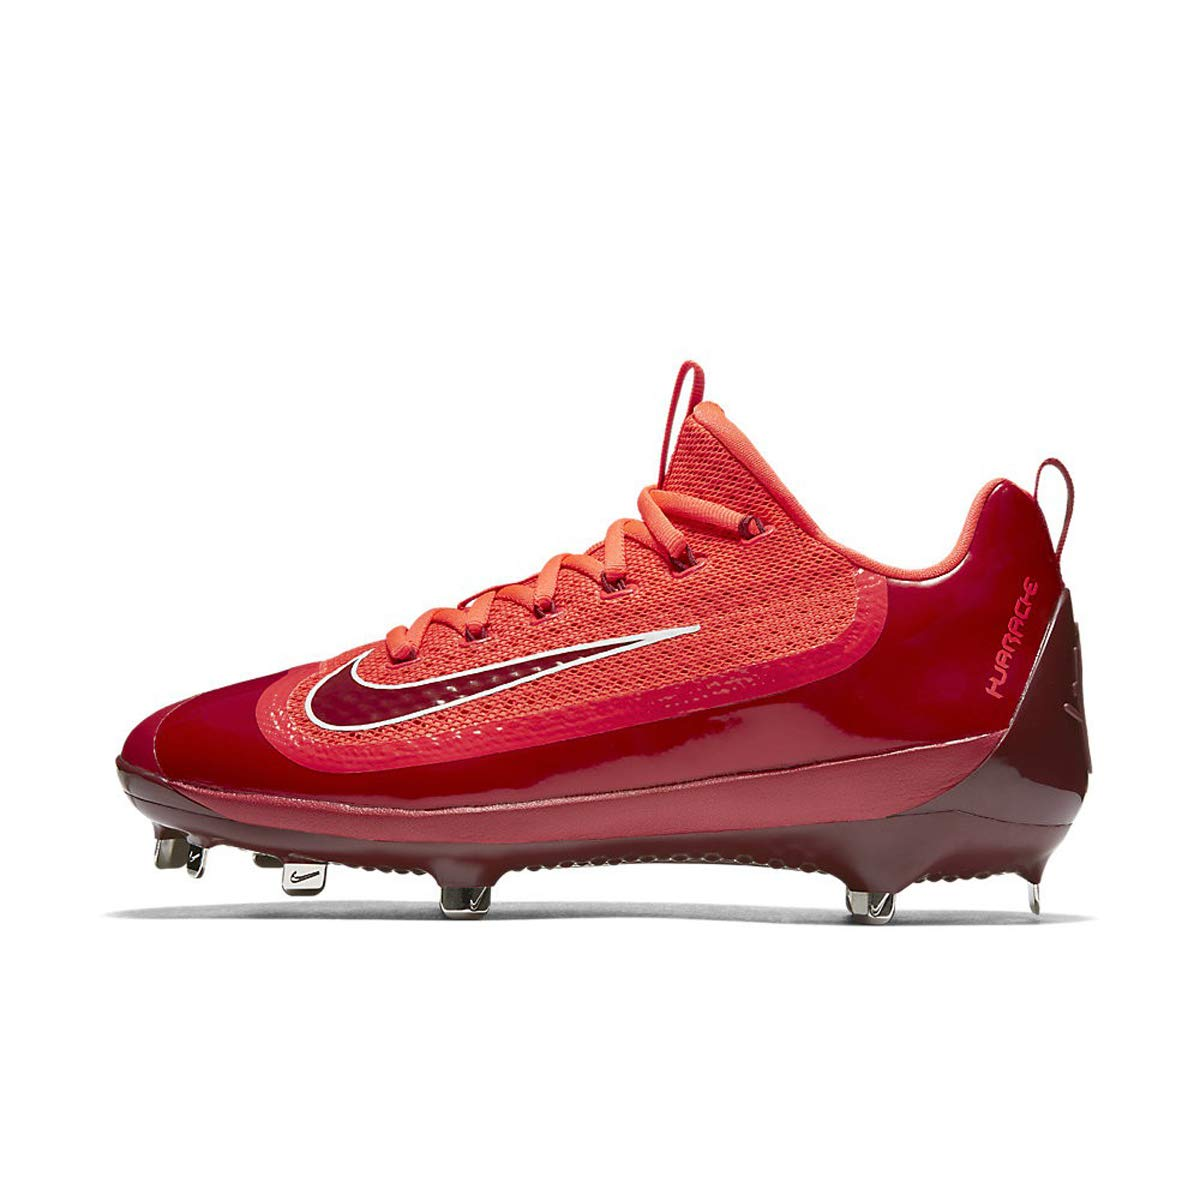 new arrival b6746 8bf6f Amazon.com | Nike Alpha Air Huarache 2K Filth Low Baseball ...